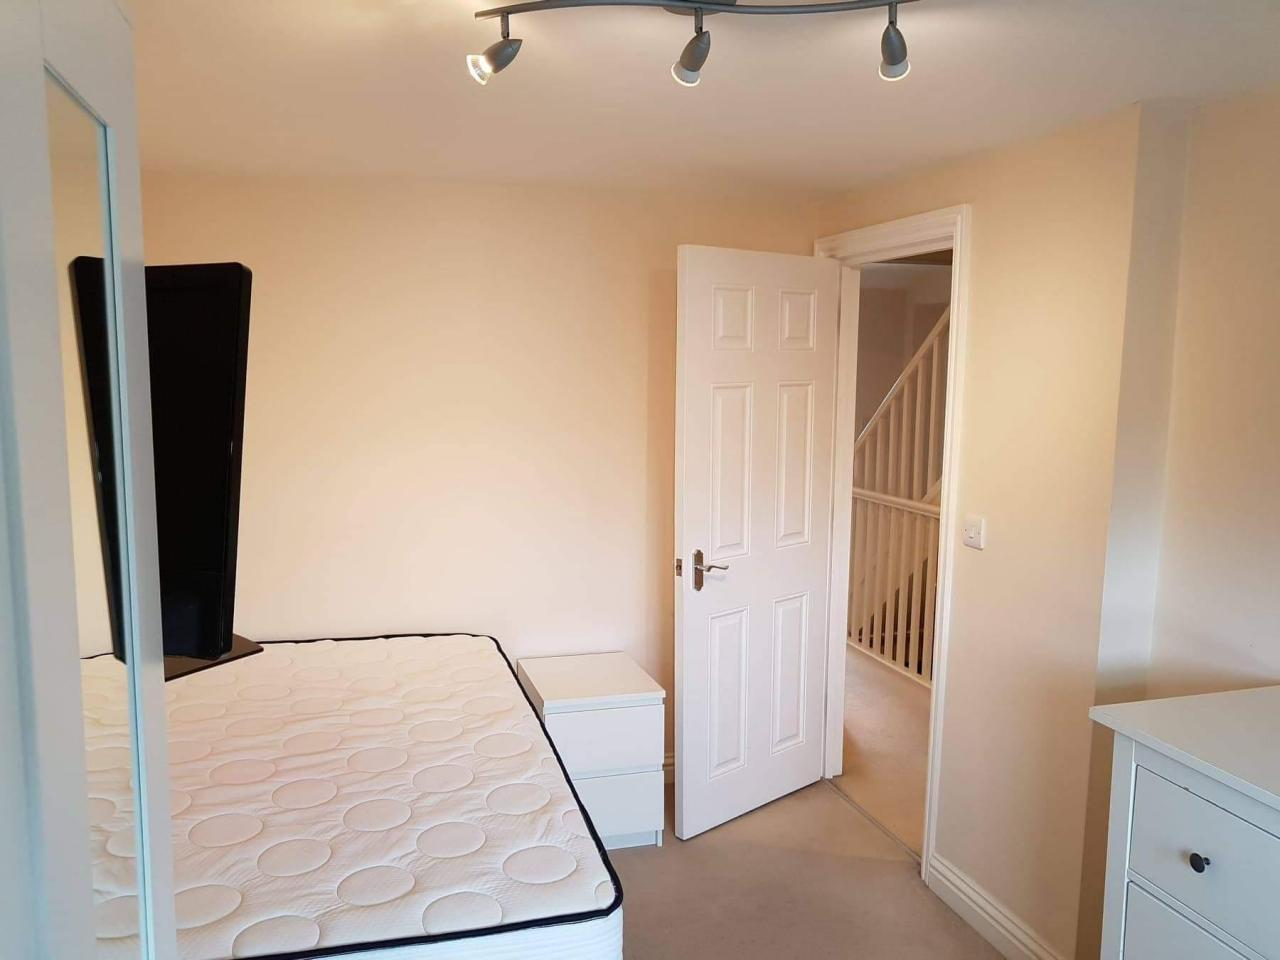 Двухместная комната в Дагенхаме - 5